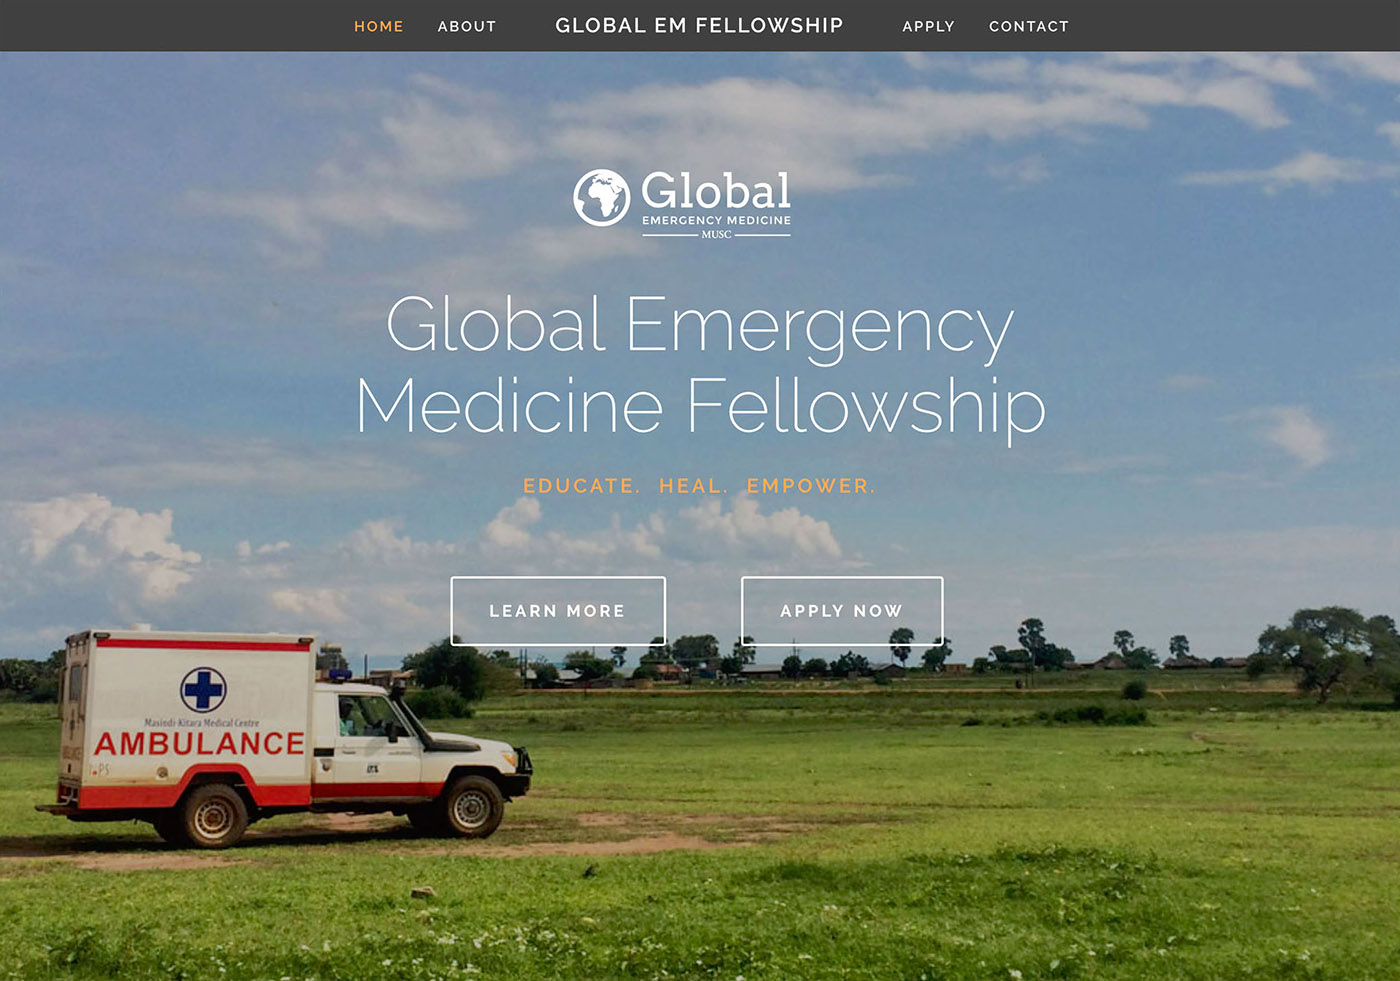 MUSC Global Medicine